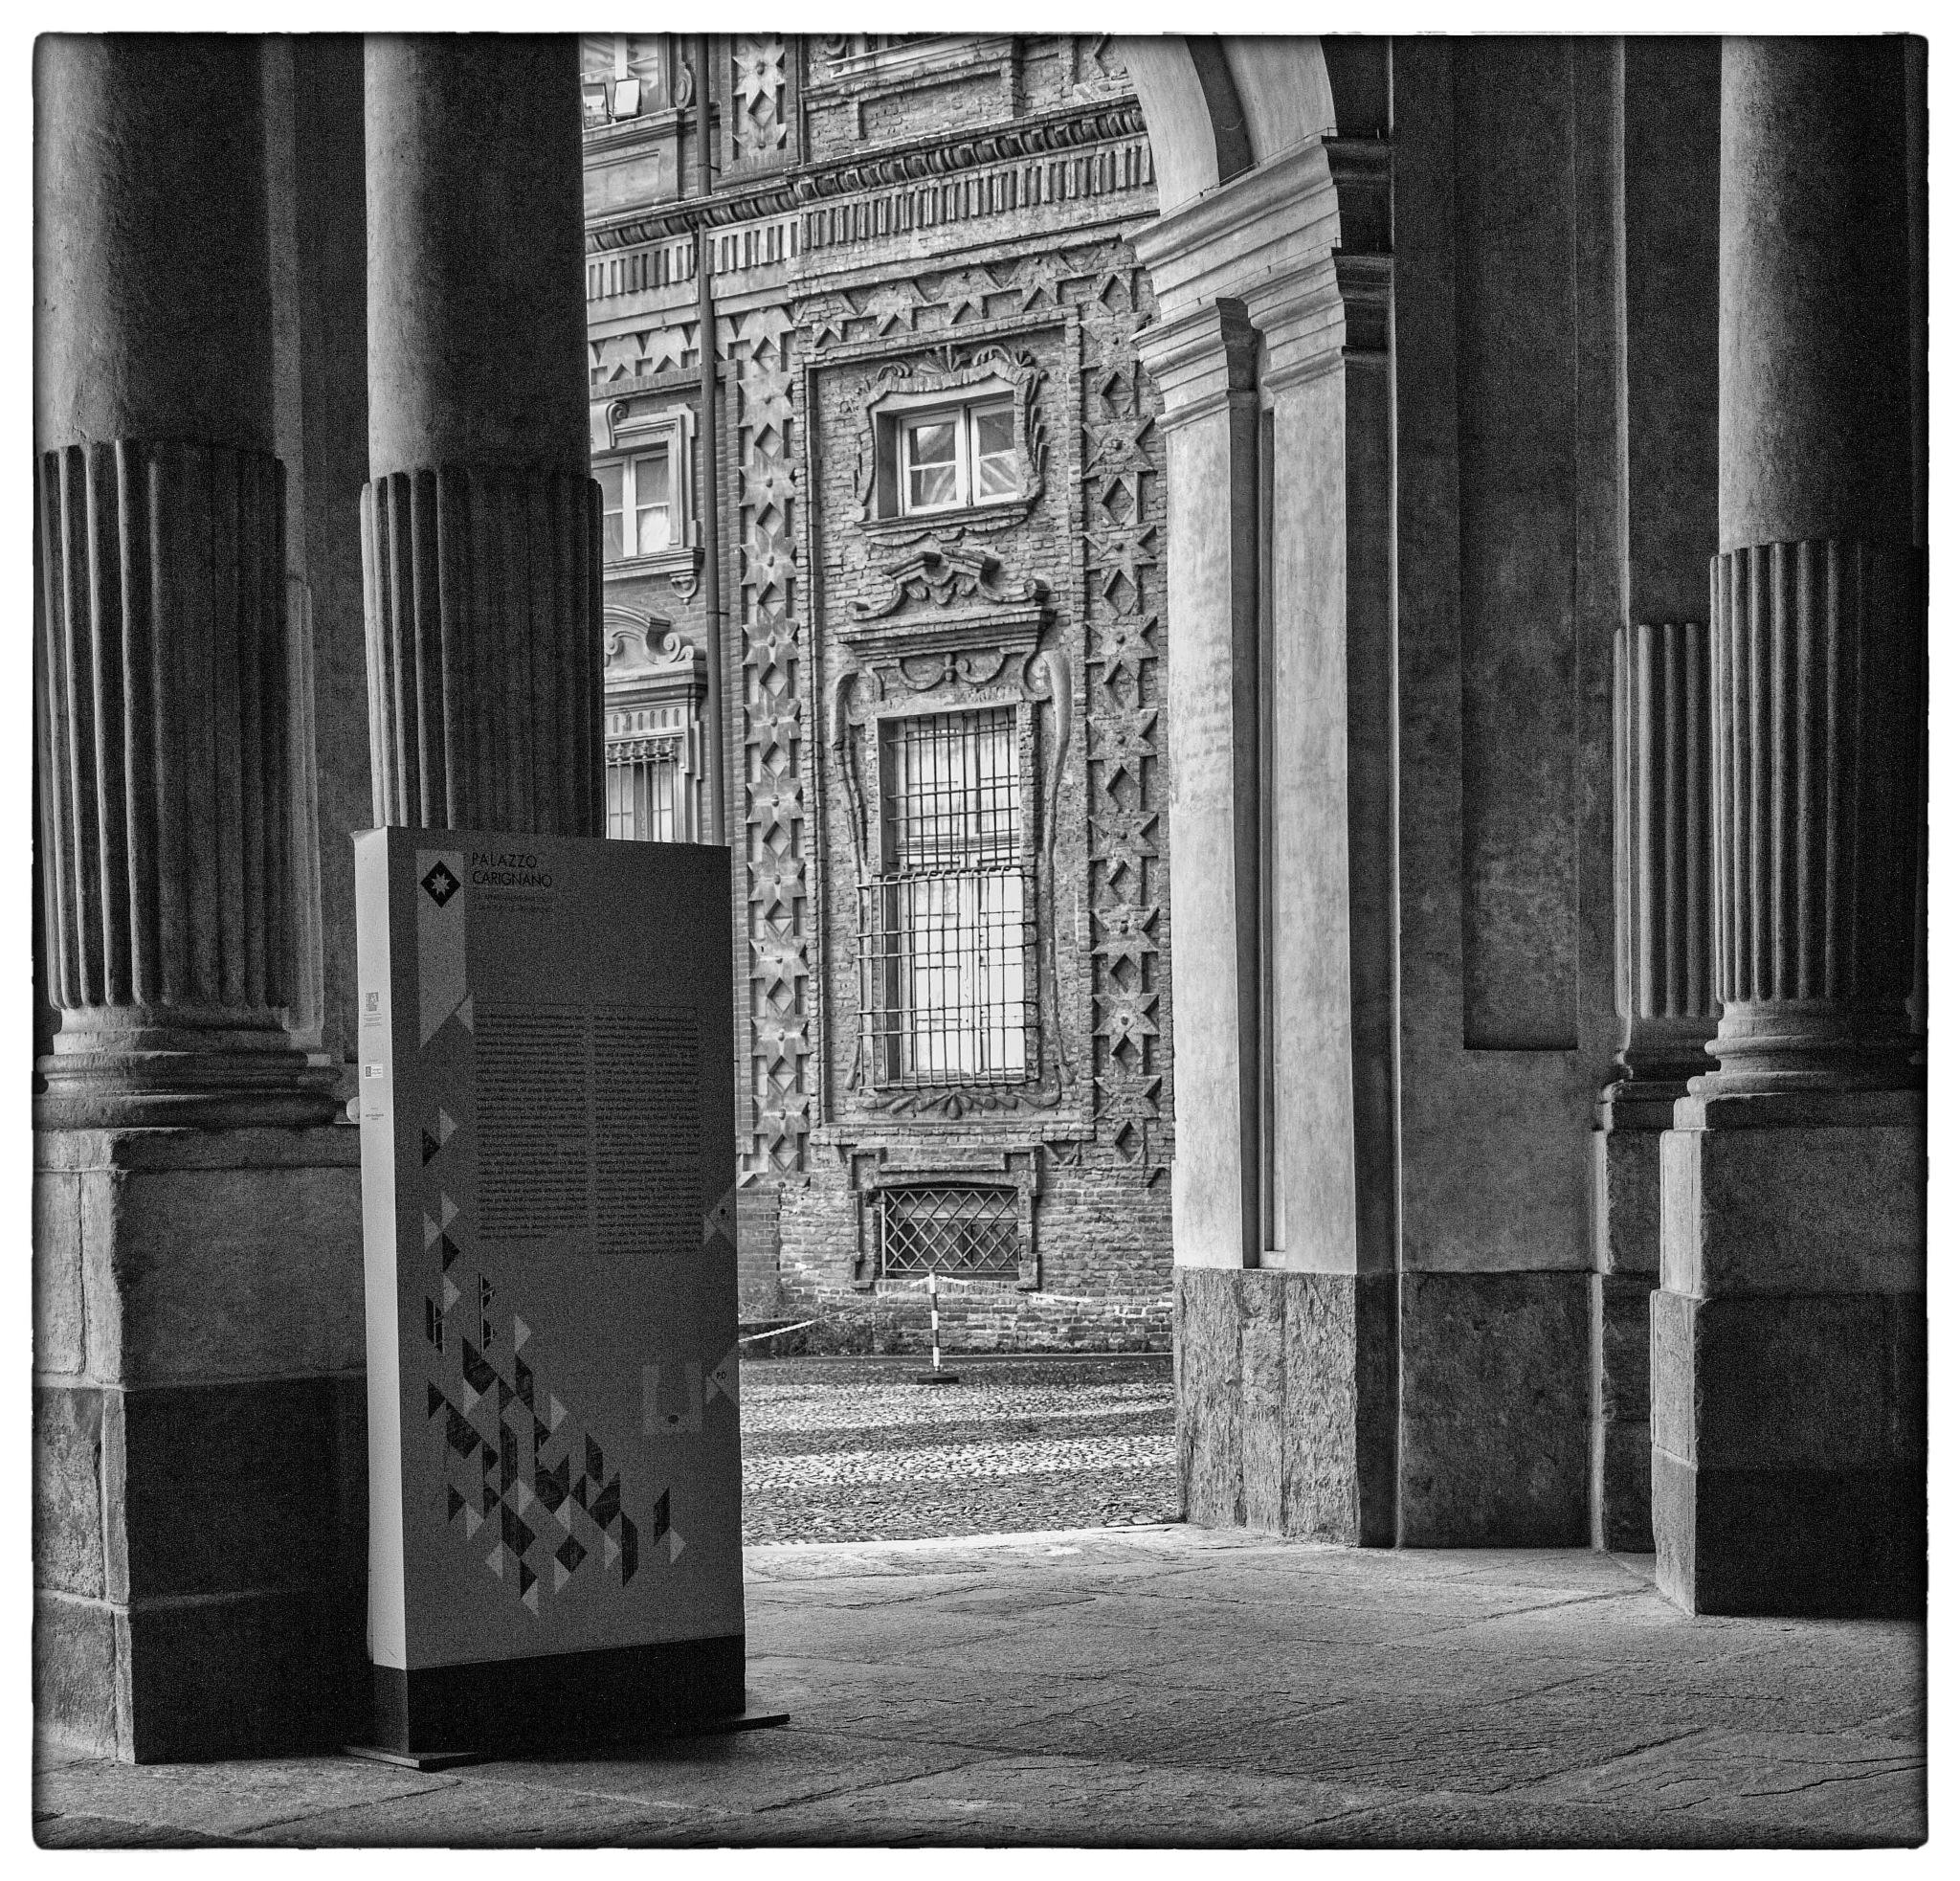 torino palazzo carignano by bcorech